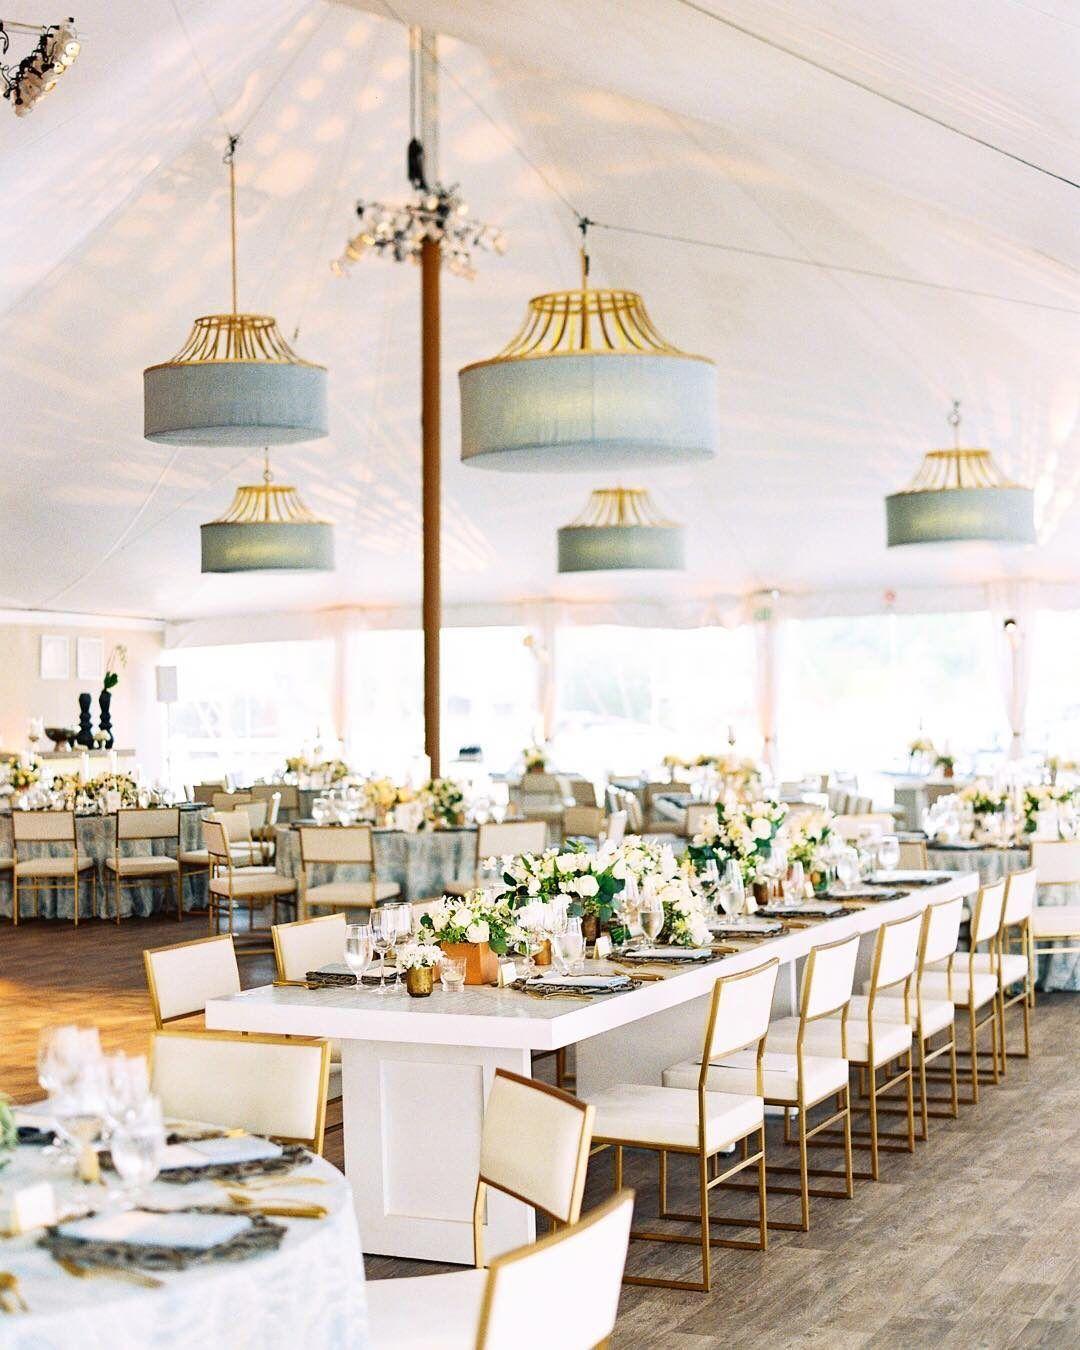 25 Unique Wedding Lights To Brighten Your Day